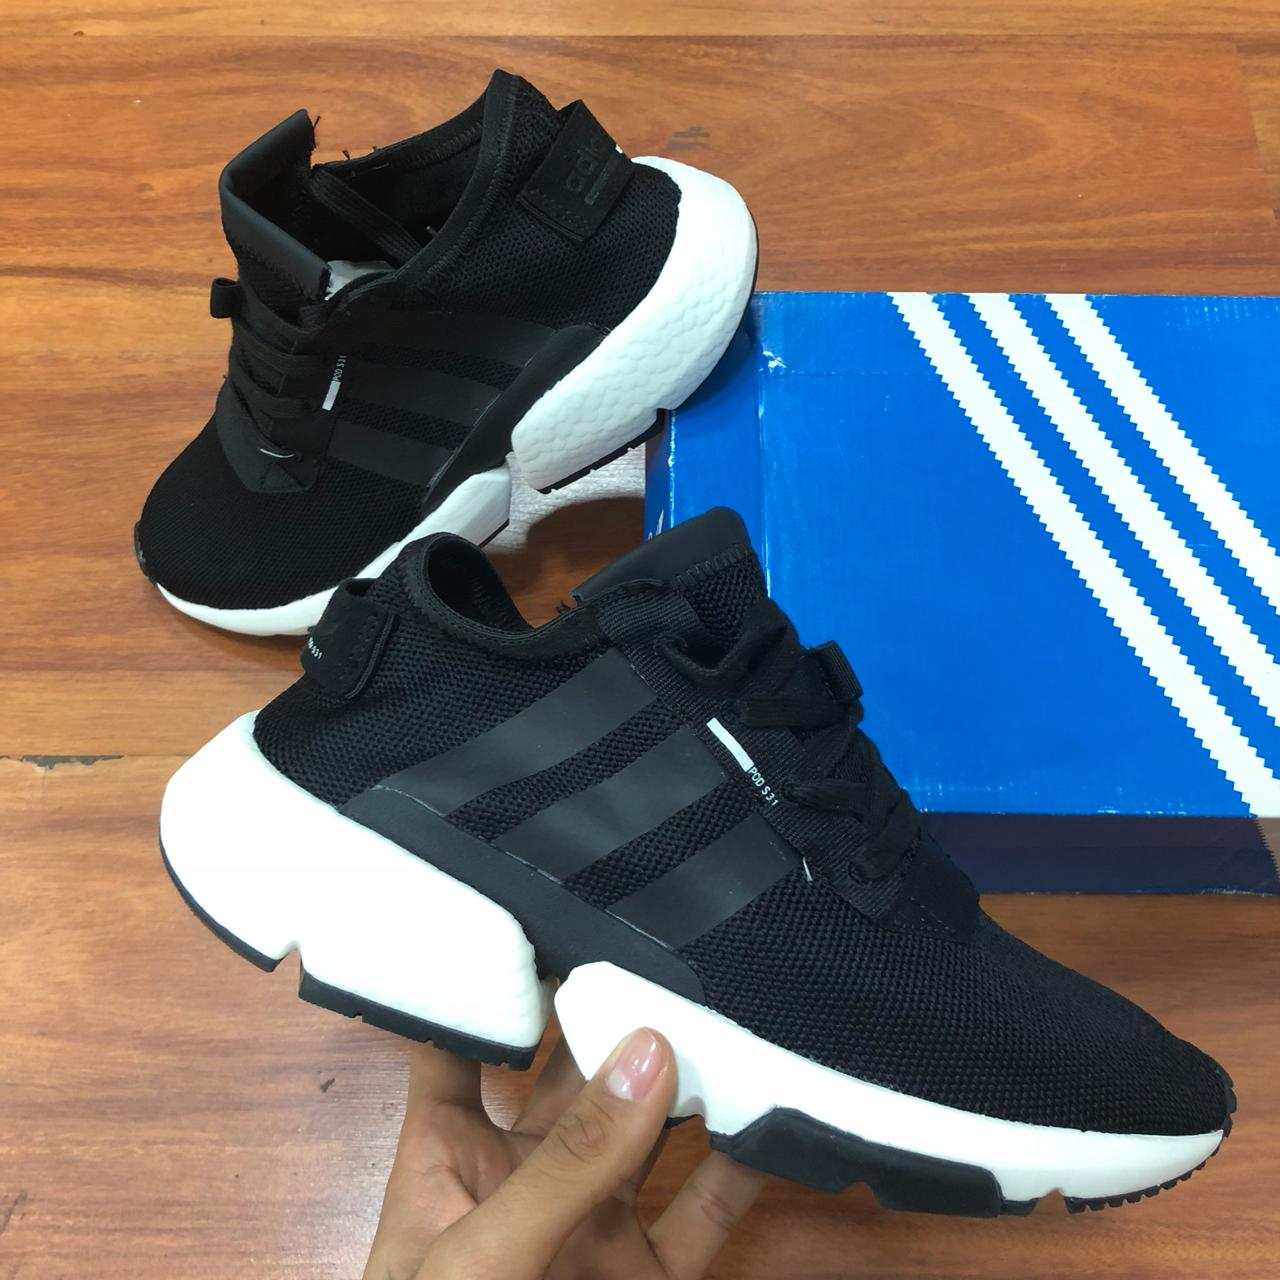 mujer Cali para Adidas Zapatillas en Zapatillas pod s31 4q5RjL3A